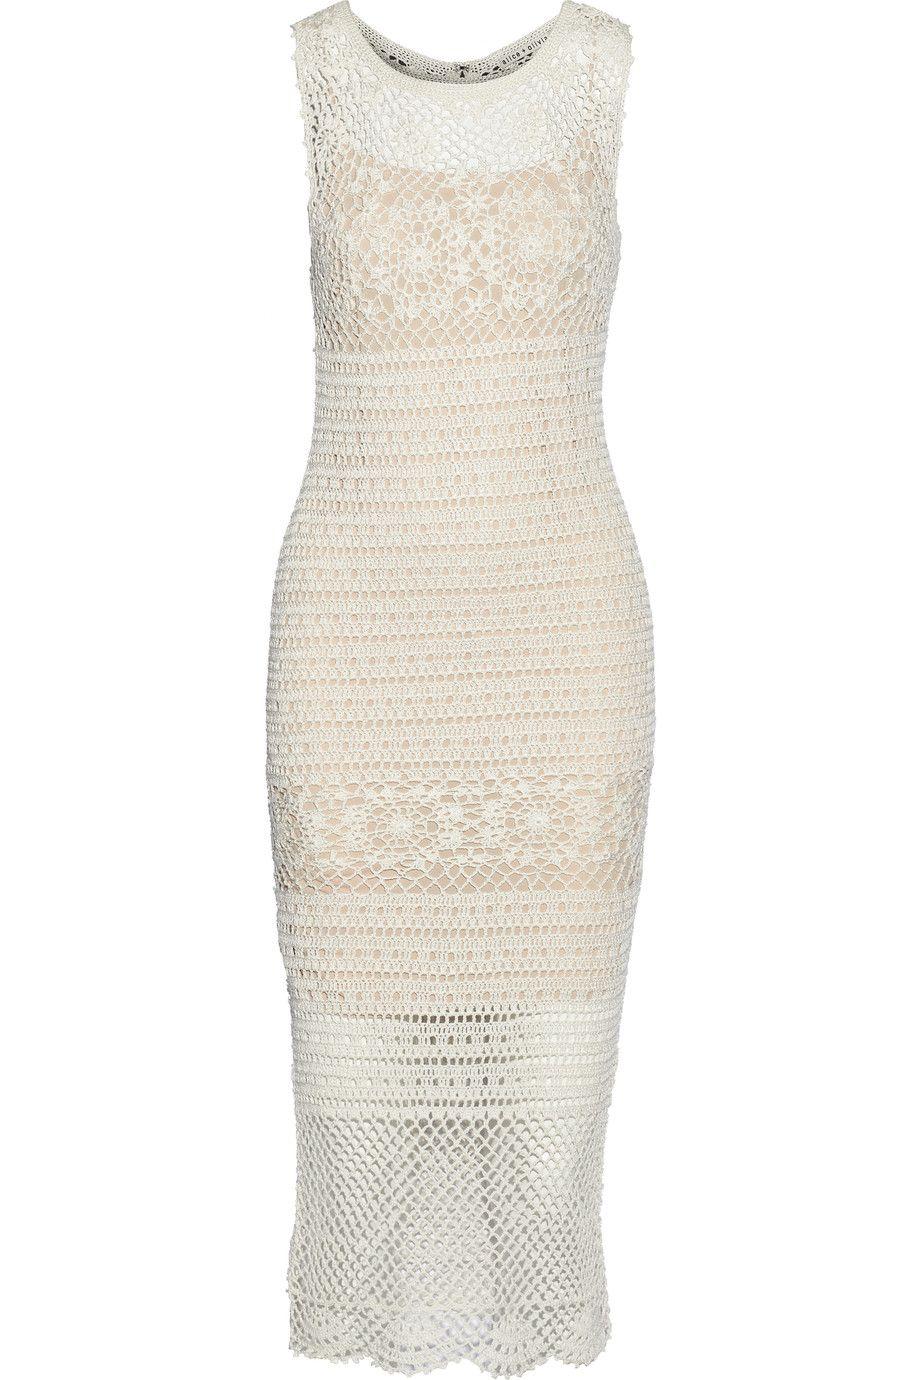 Alice Olivia Amari Crocheted Linen Blend Midi Dress